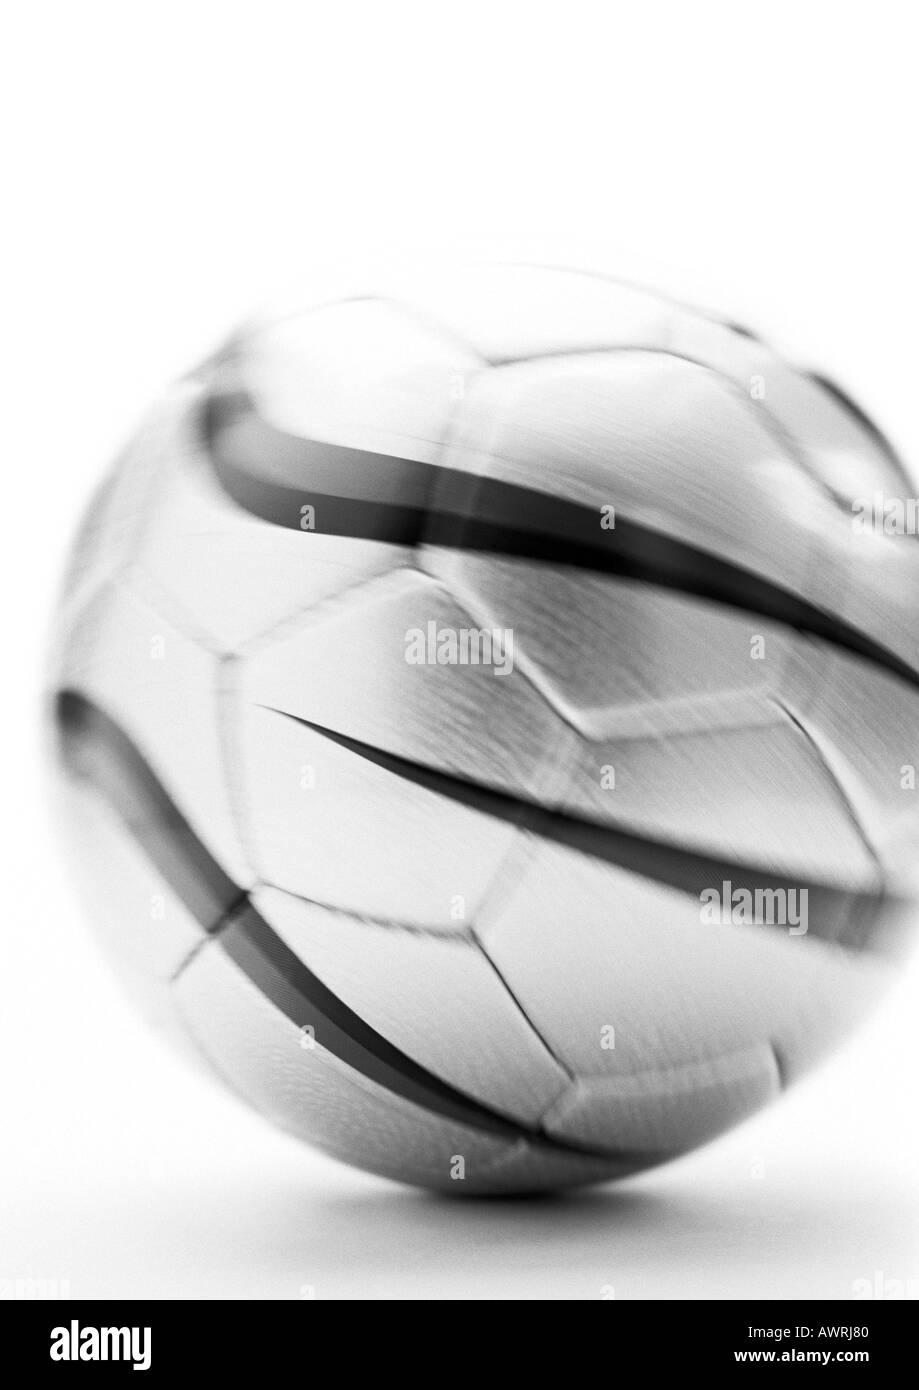 Soccer ball, close-up, b&w. - Stock Image